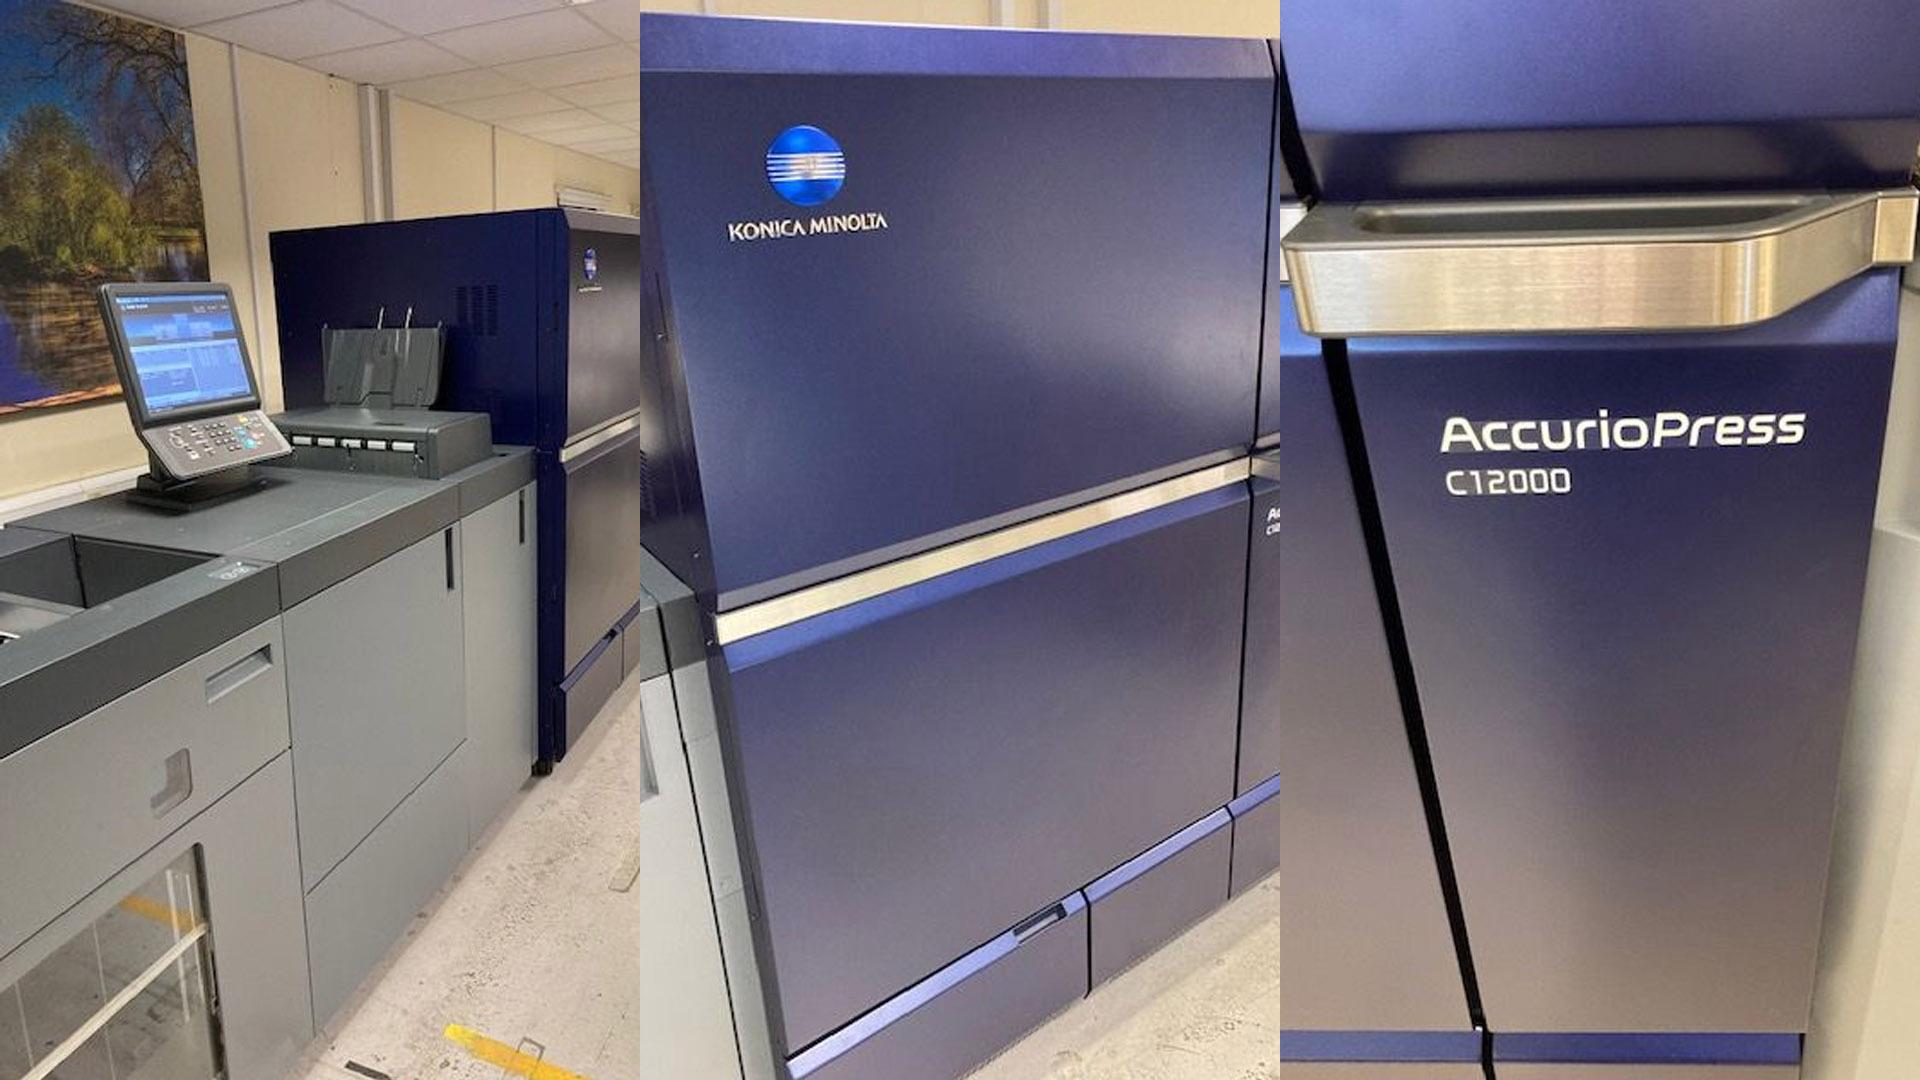 The Printroom UK upgrades equipment to meet customer needs